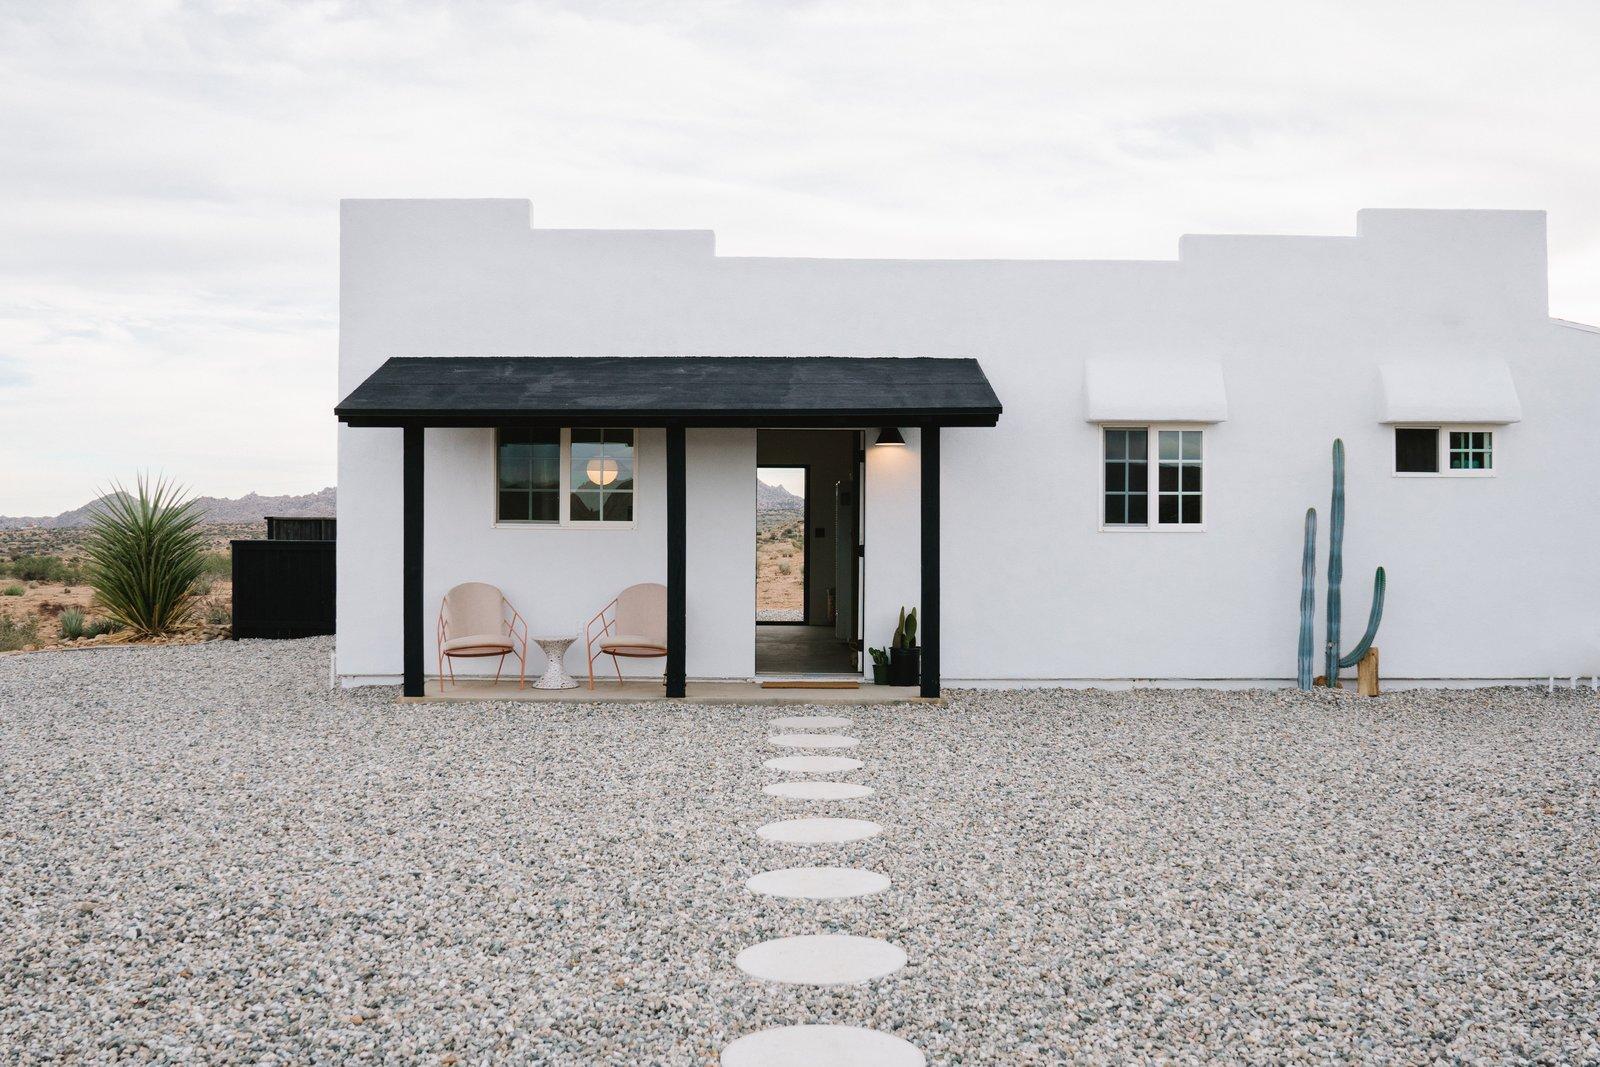 Construction Diary: A Serene Desert Hideaway Is Part Rental, Part Designer Showcase